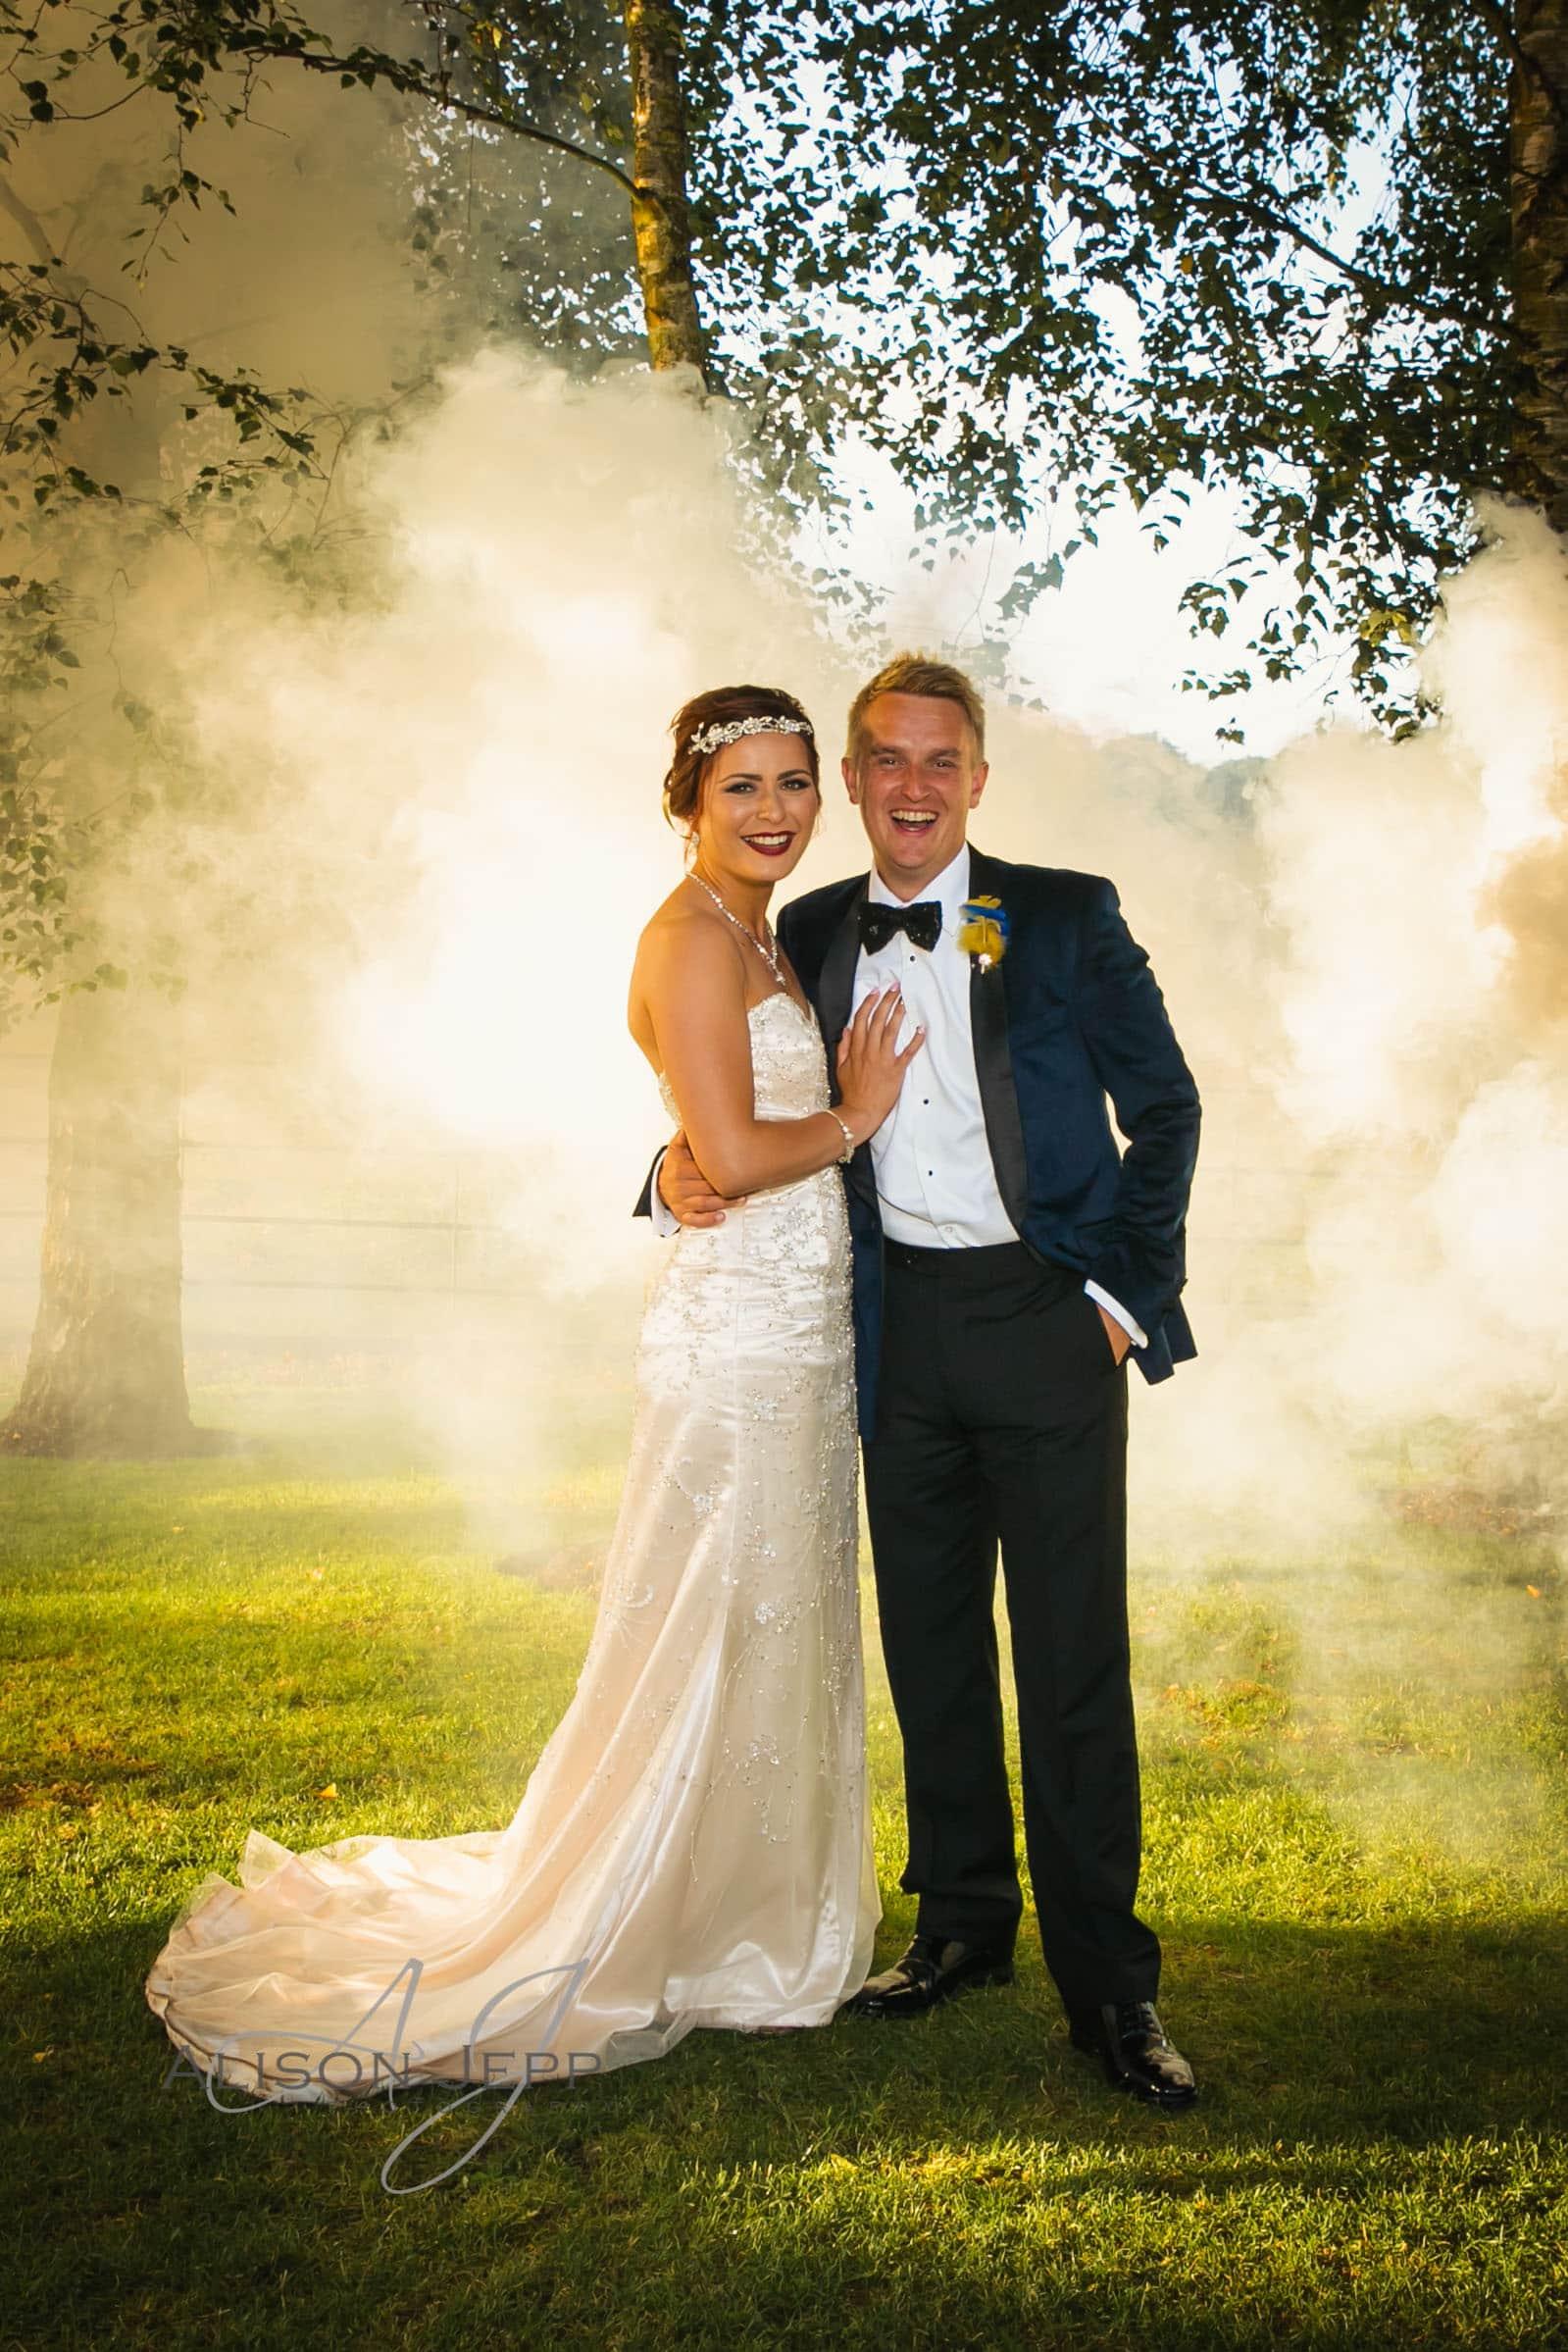 AJP2016-08-19-Mr & Mrs Newman-HR-877